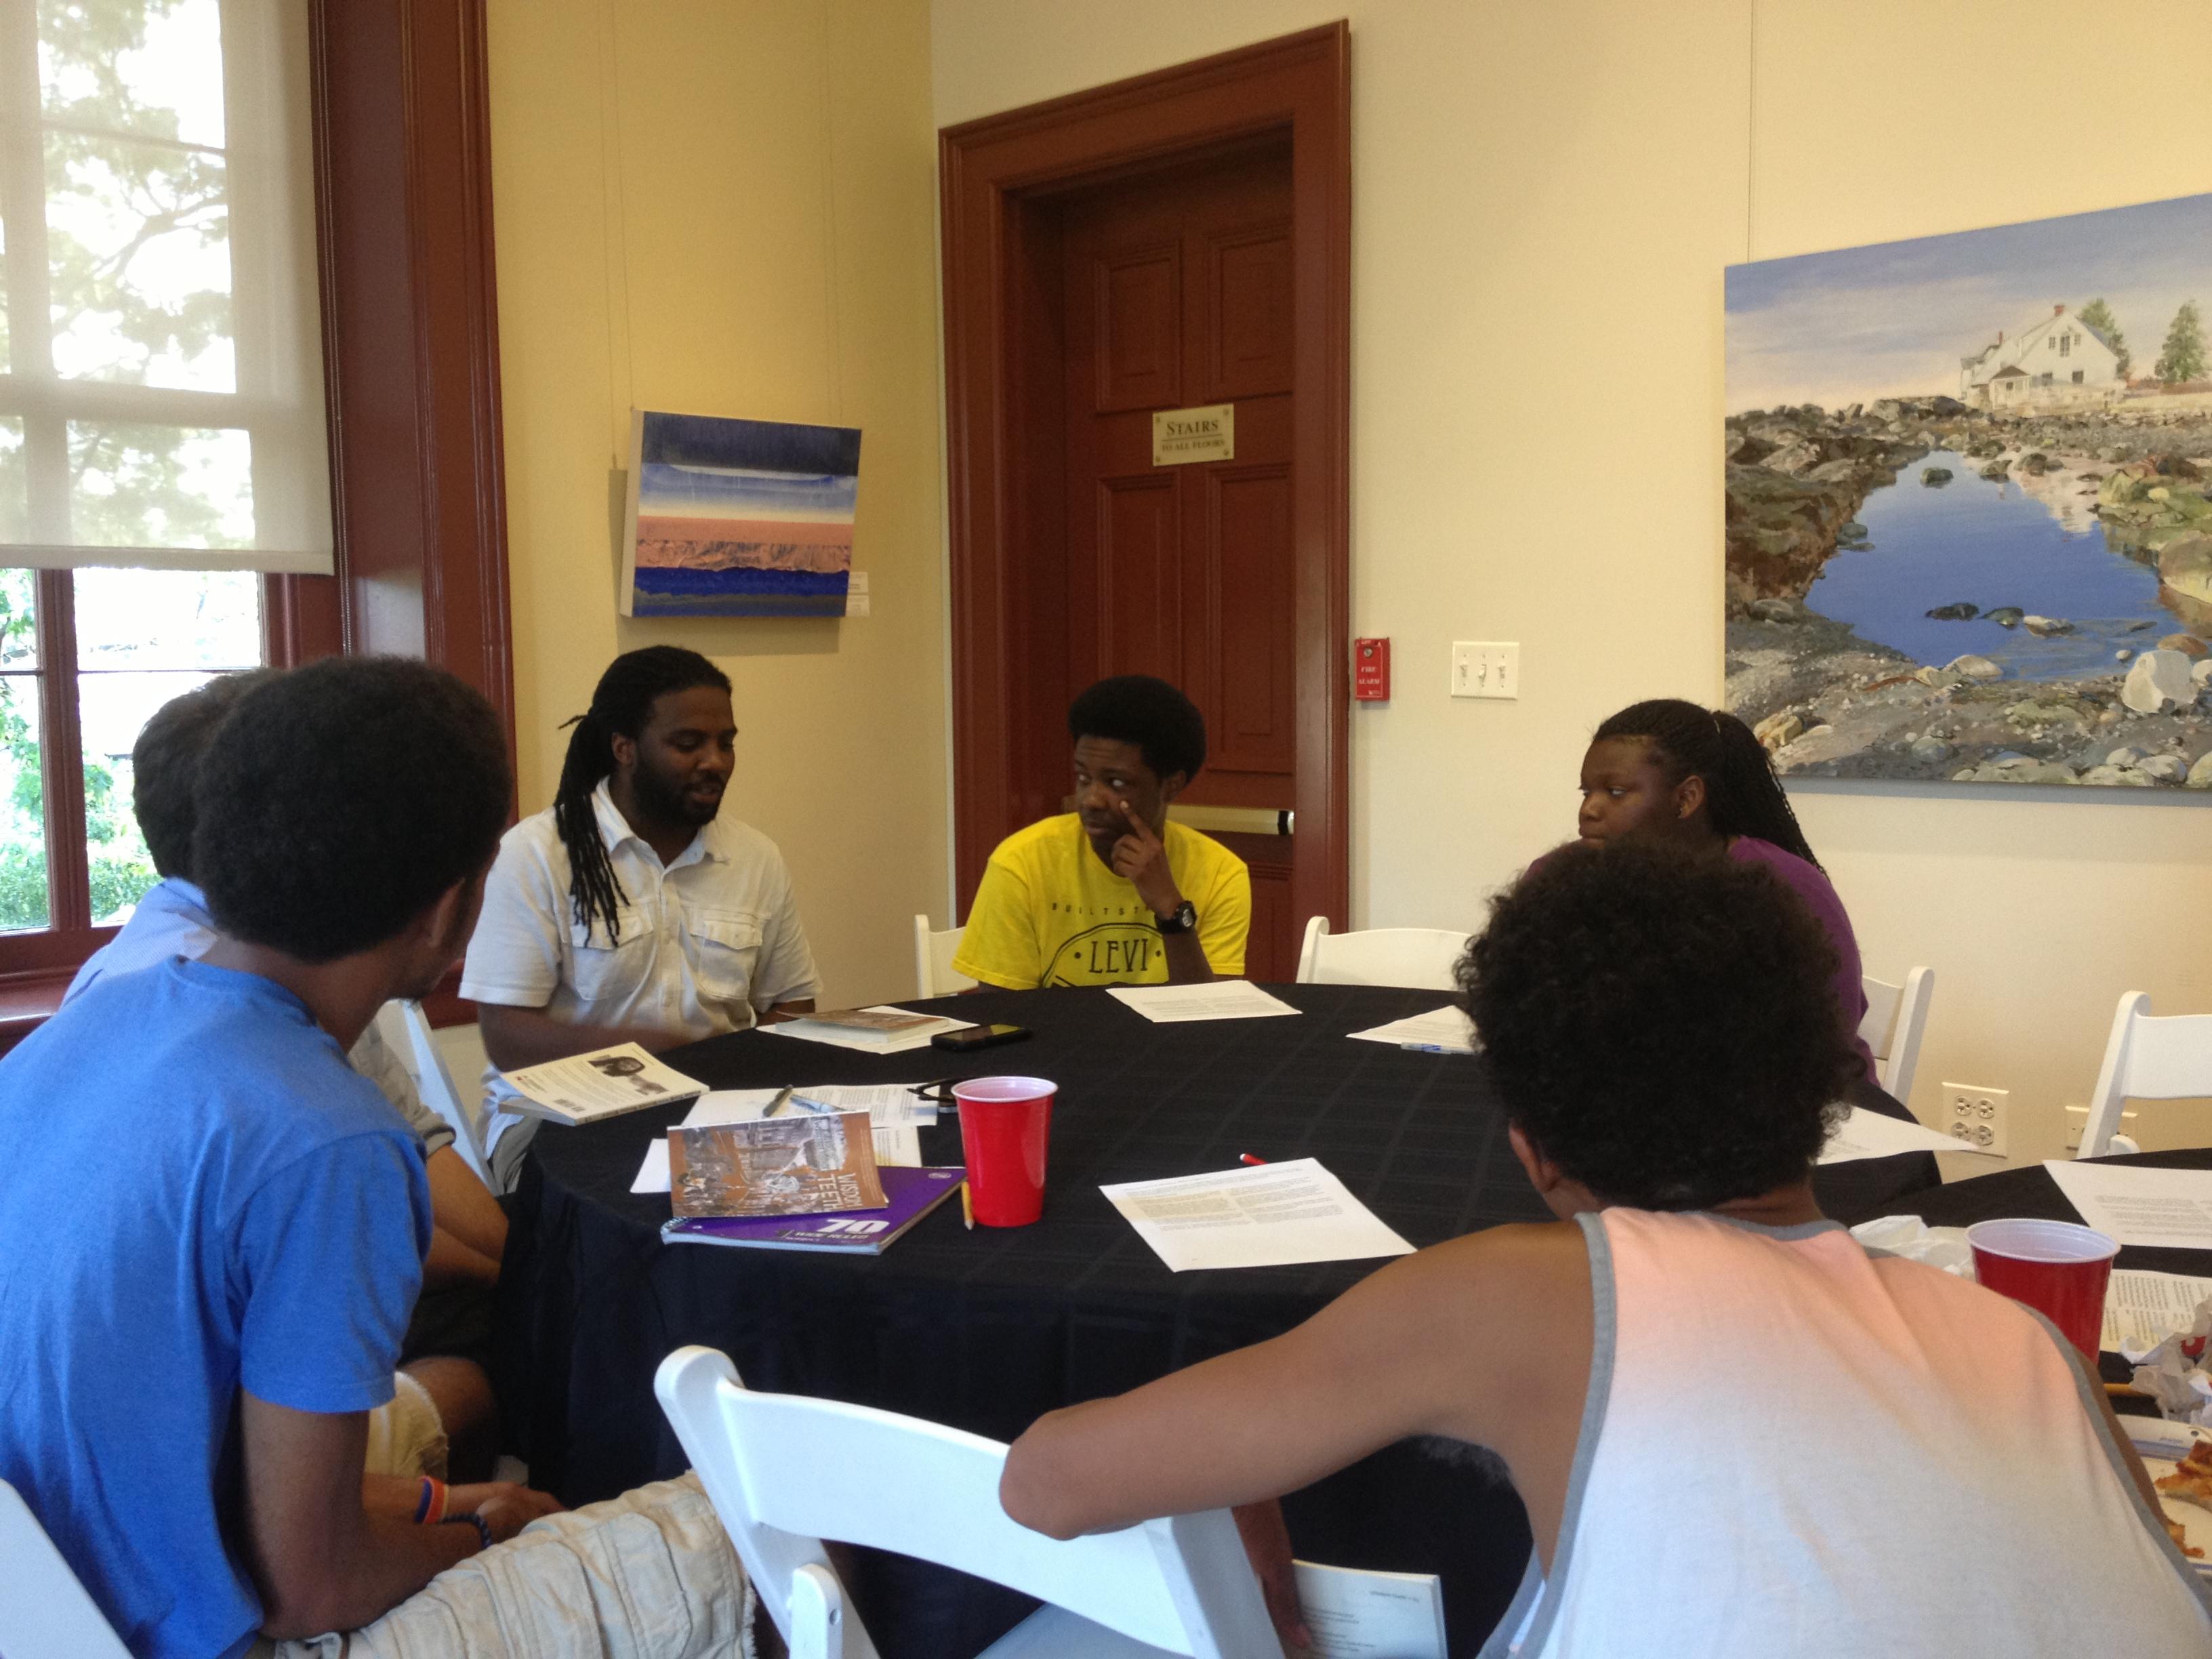 Derrick Weston Brown at PEN/Faulkner's Summer Supper & Book Club